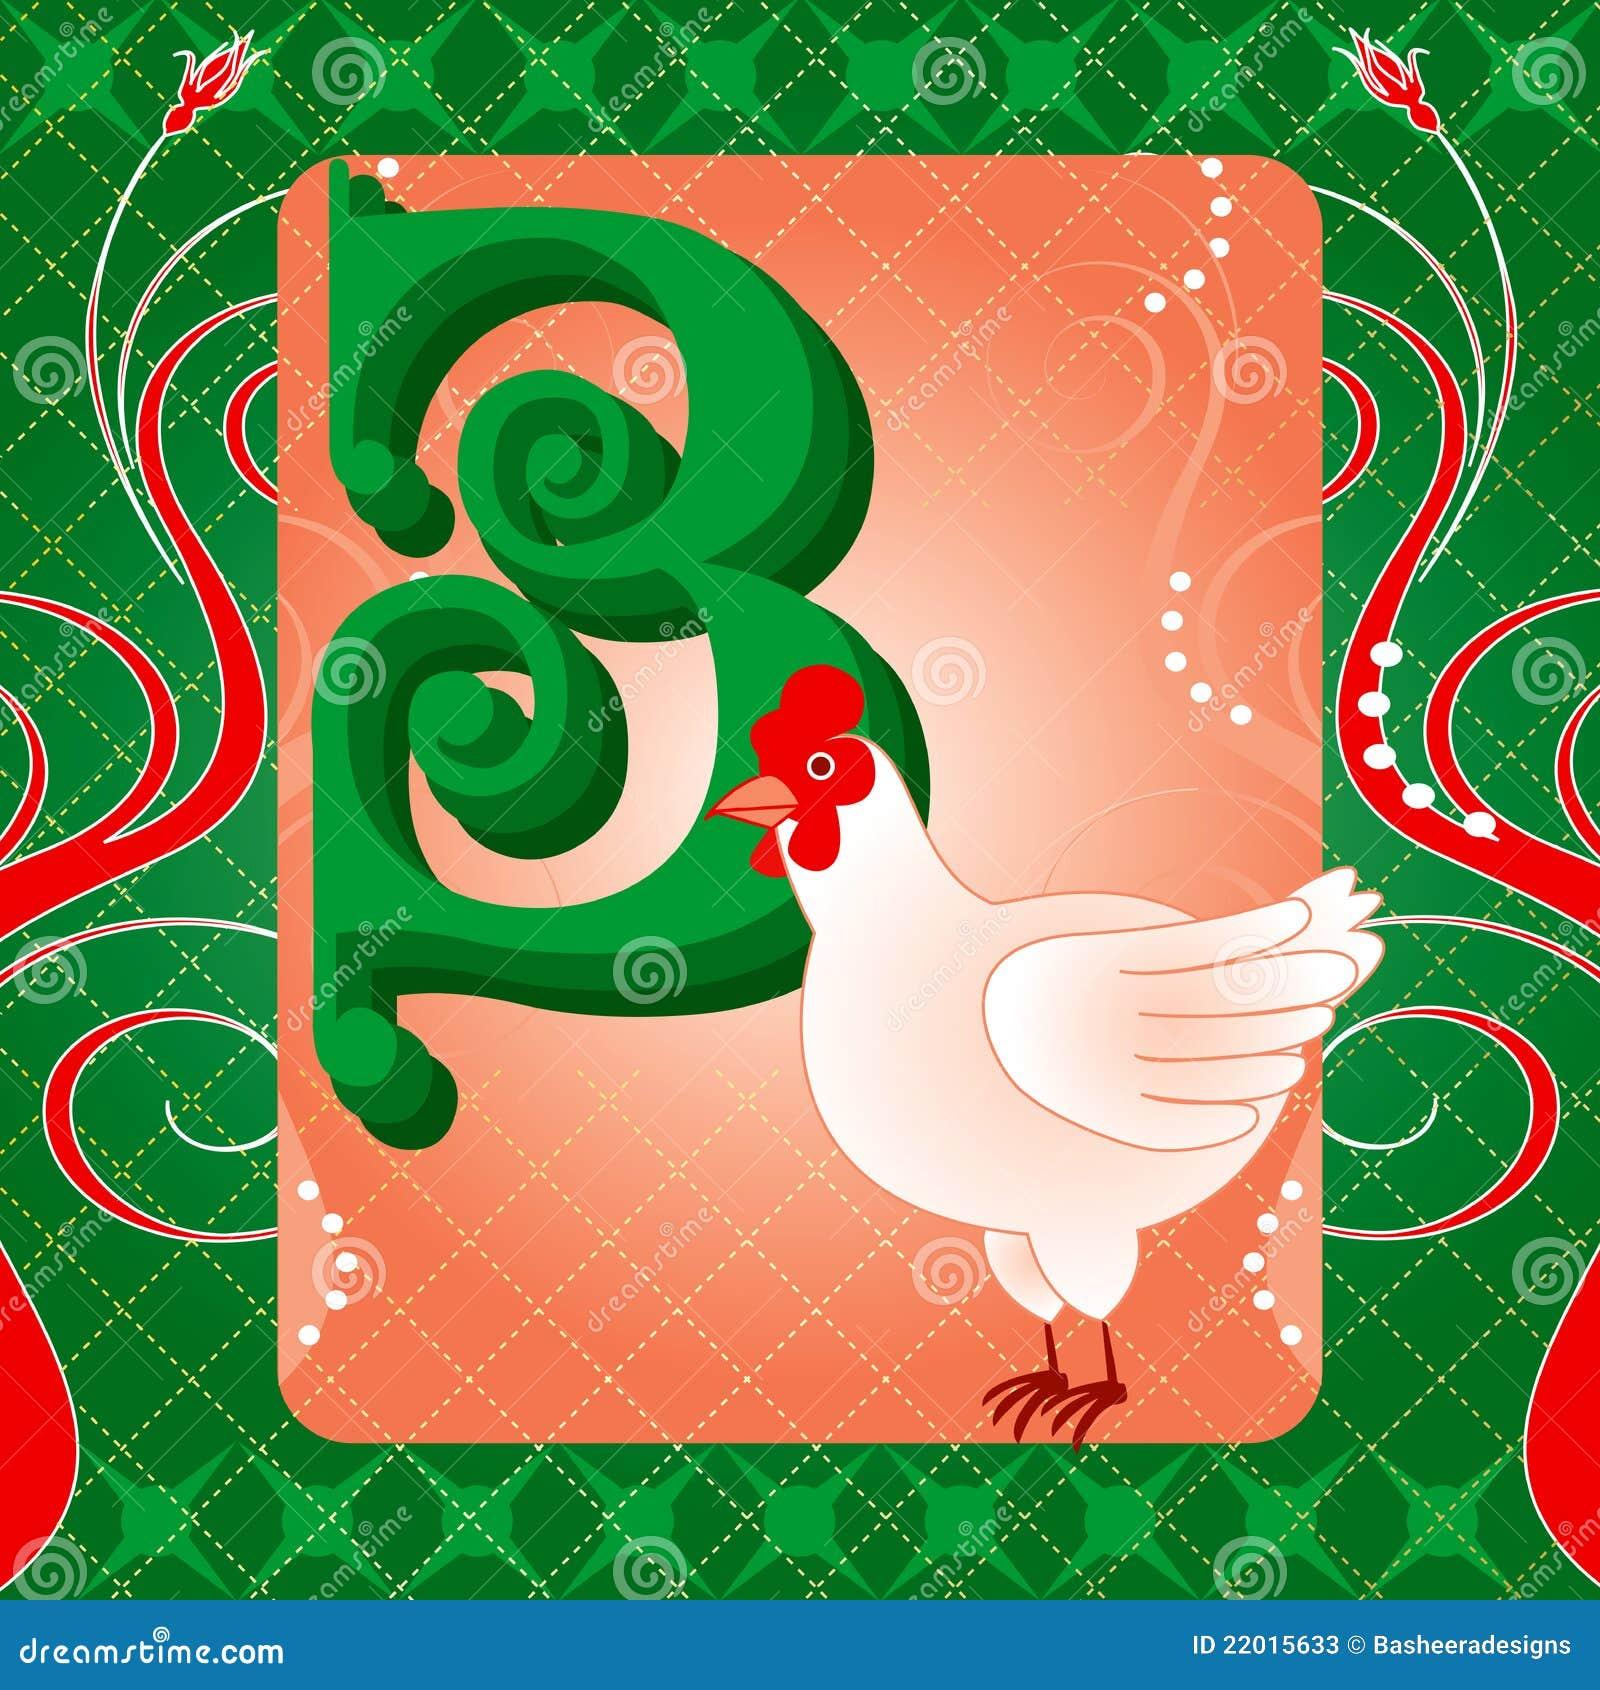 3rd Day Of Christmas Stock Photos - Image: 22015633